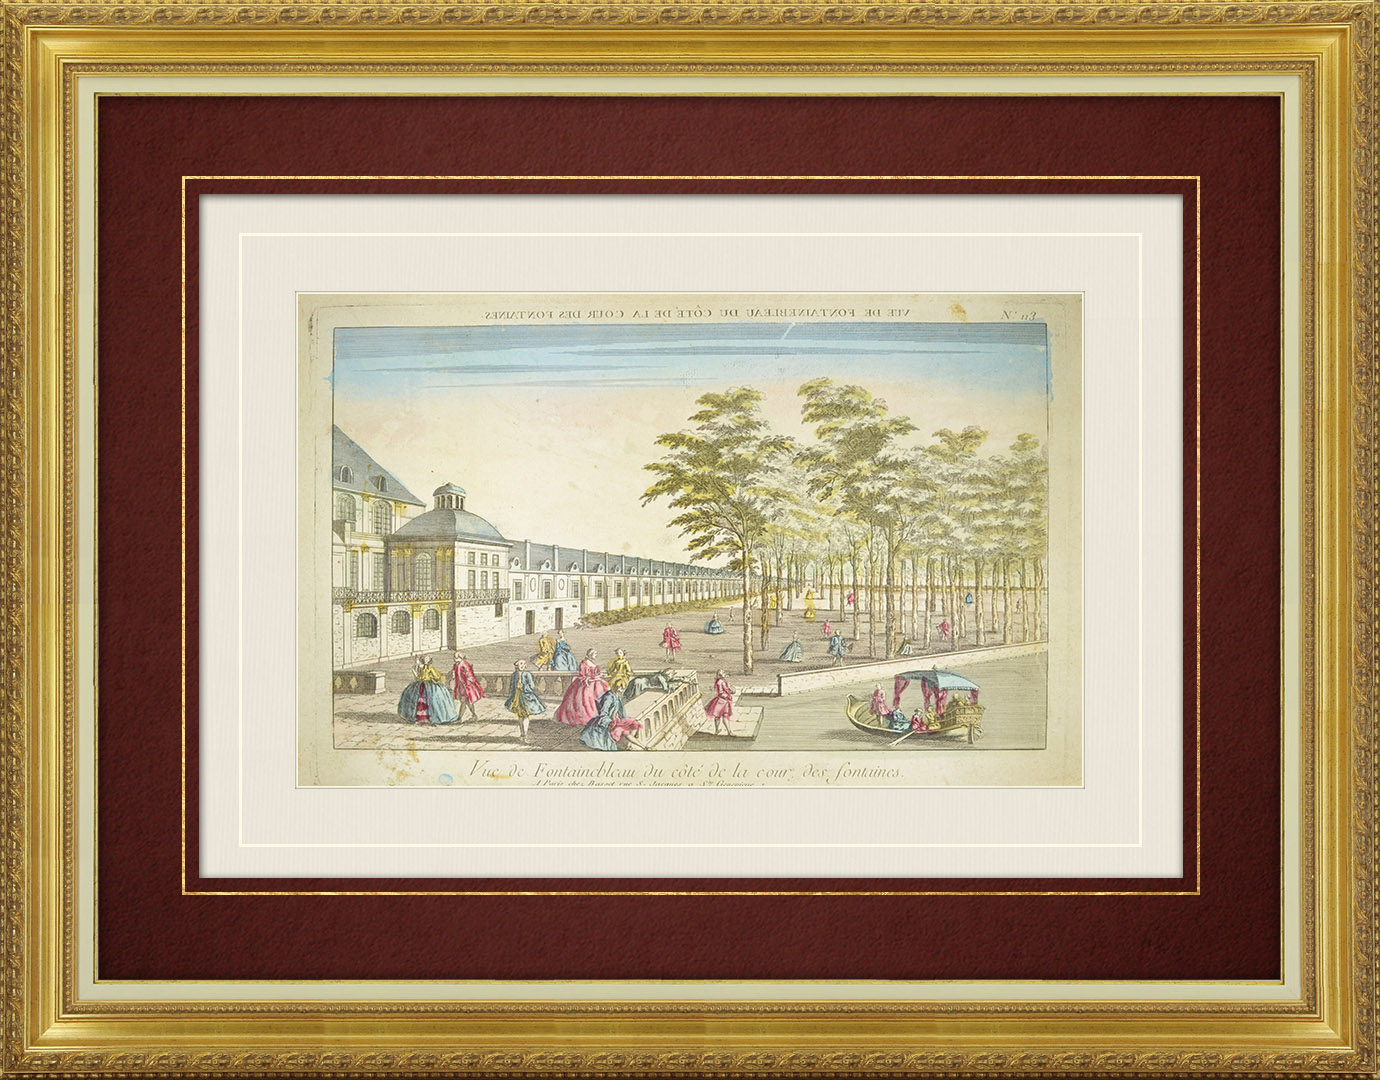 18th Century optical view in original watercolors of Fontainebleau - Cour de la Fontaine (France)